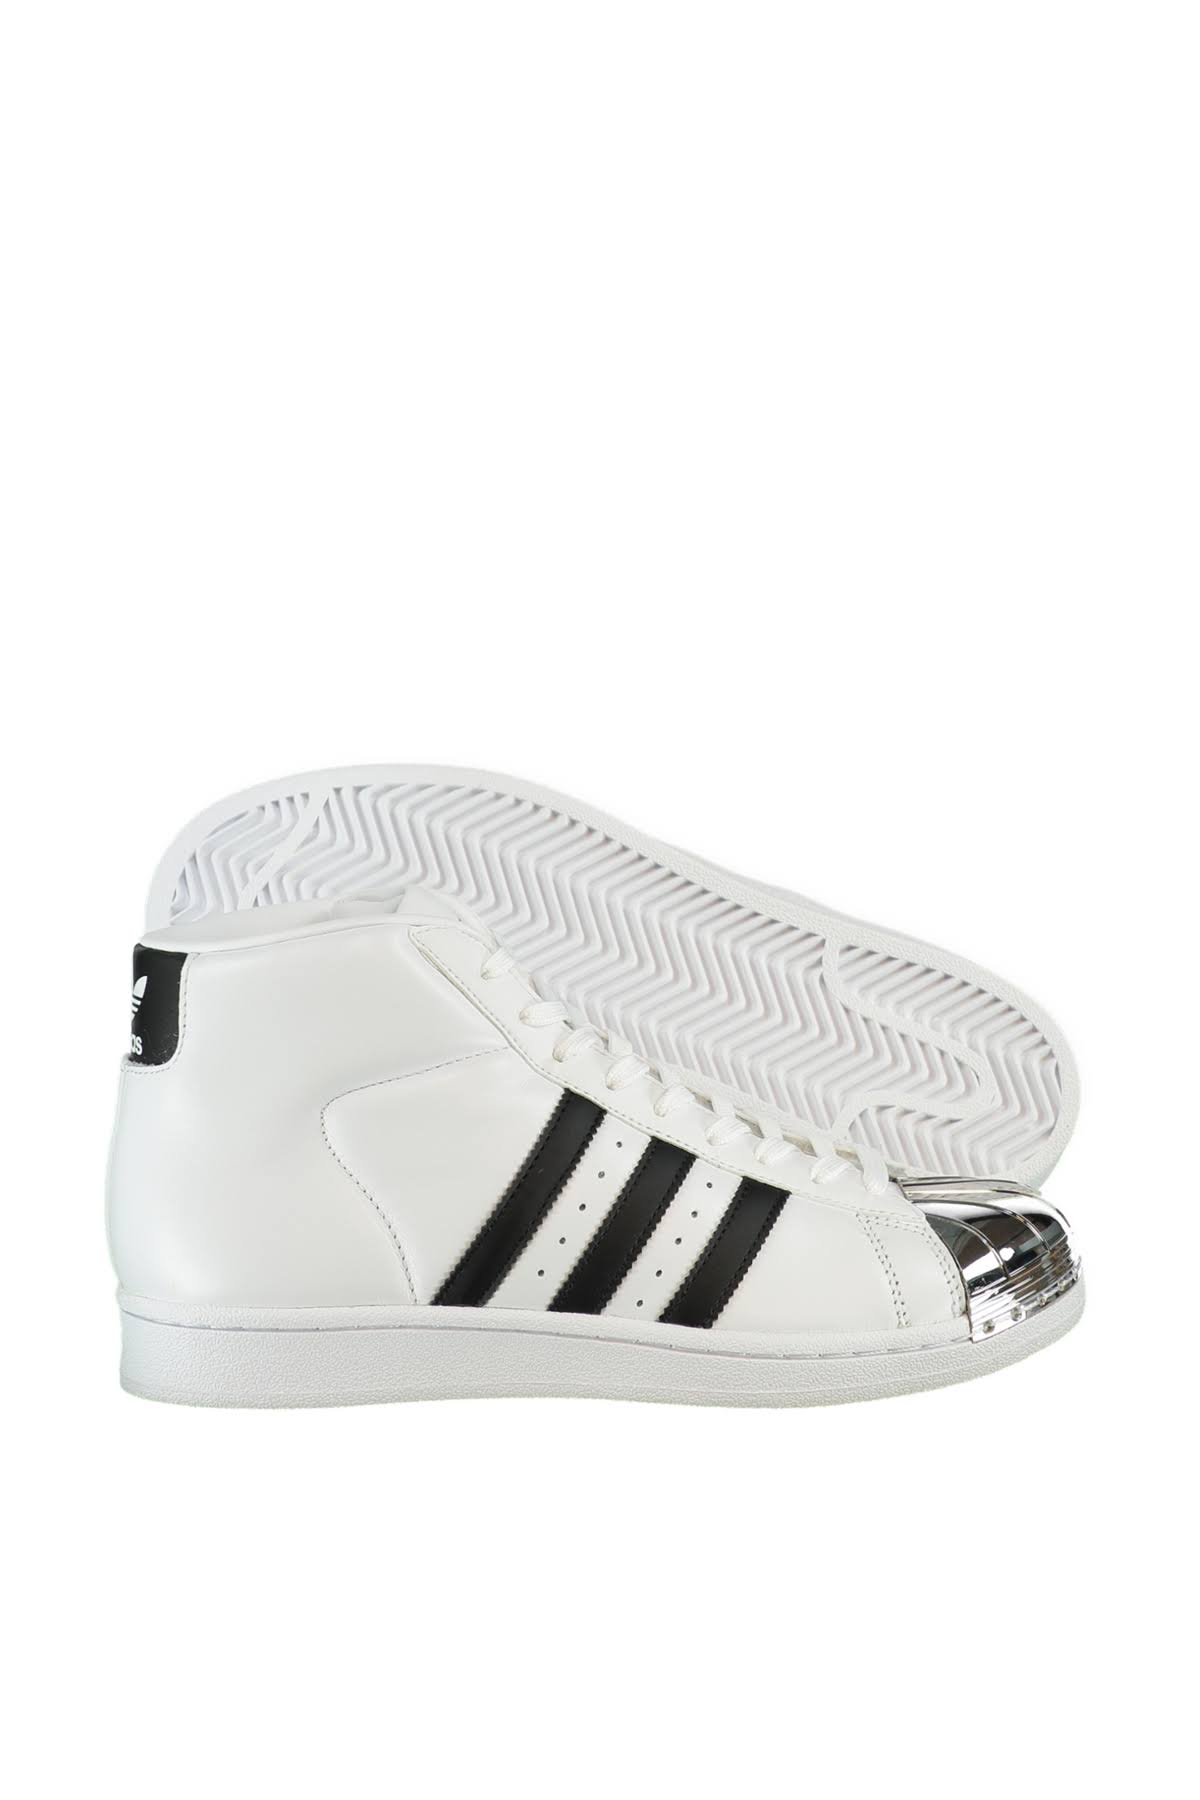 5 Kadın W 36½ 36 Toe Metal Ayakkabı Promodel Bb2131 Adidas Beyaz XIwxqZ8x